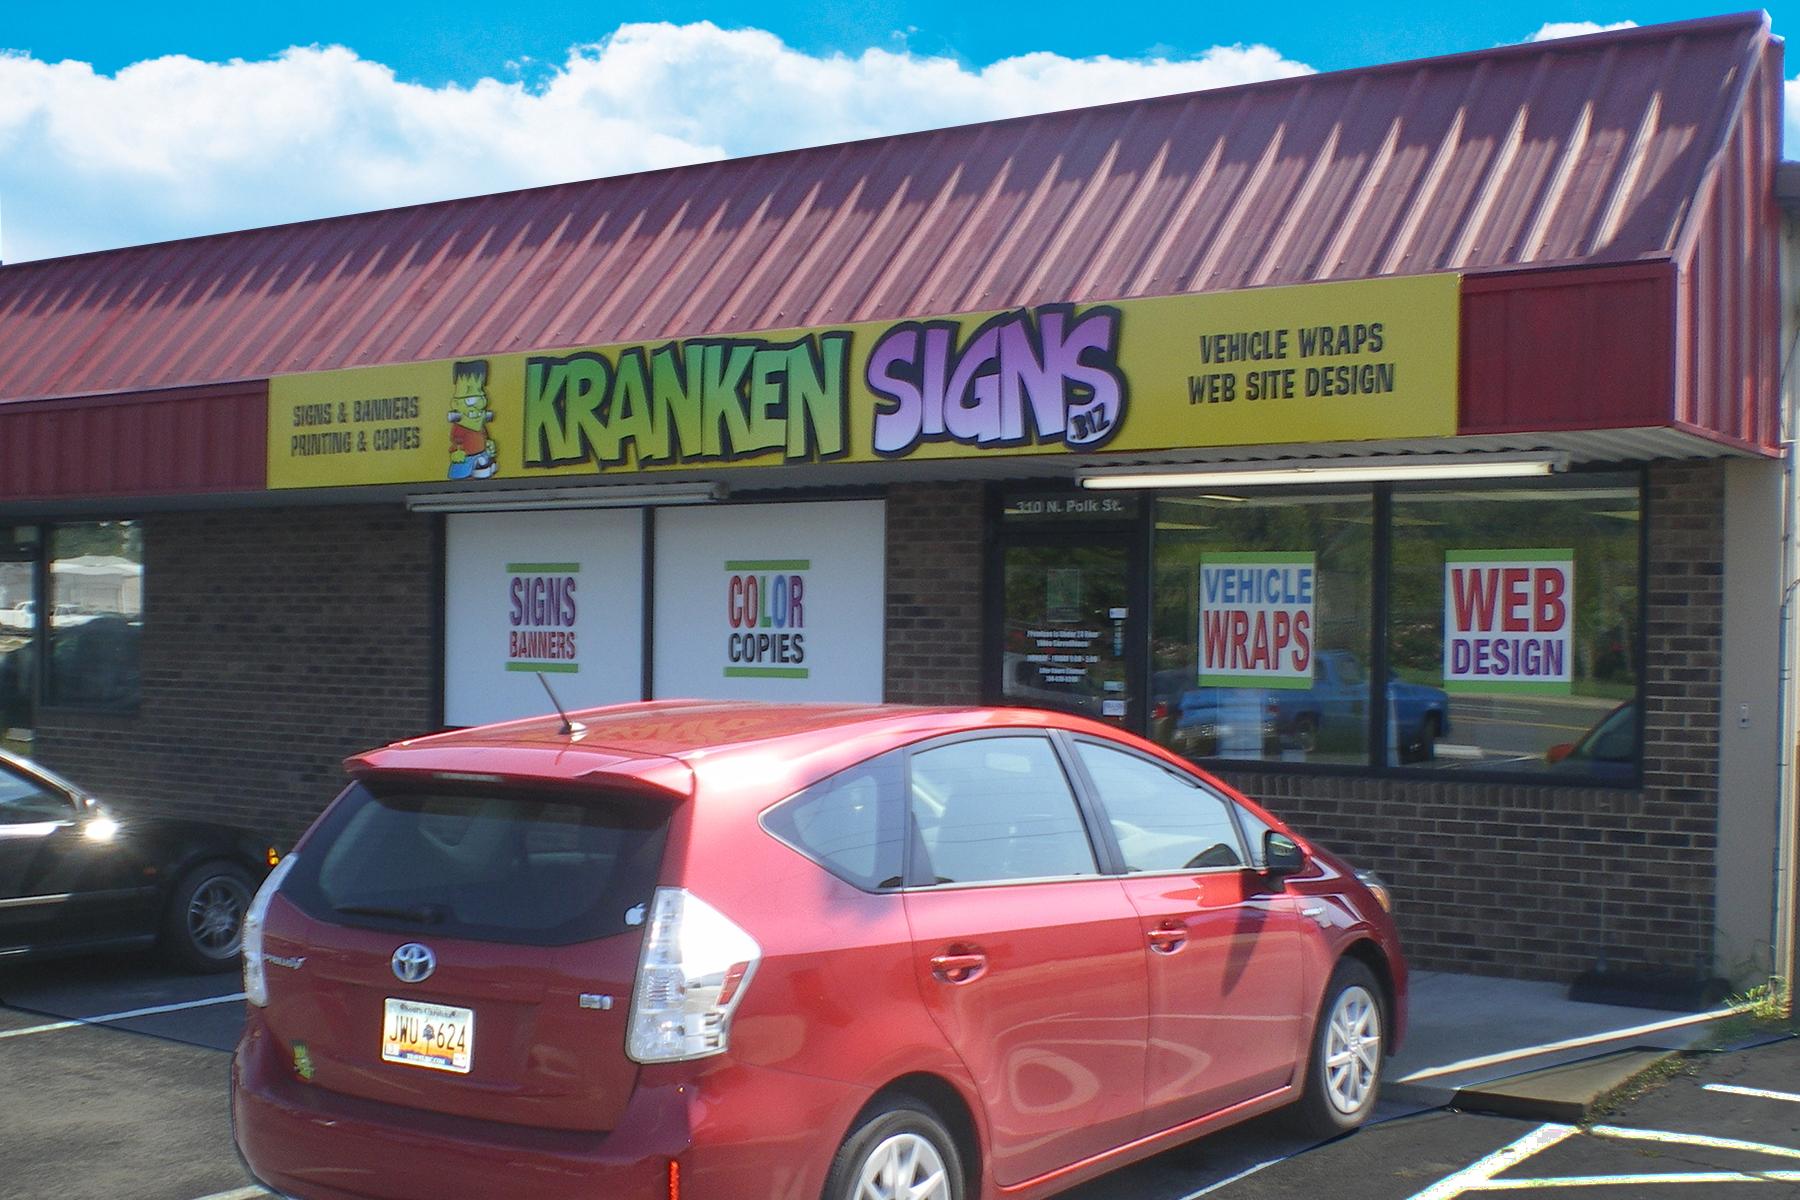 Kranken Signs Vehicle Wraps Charlotte image 2